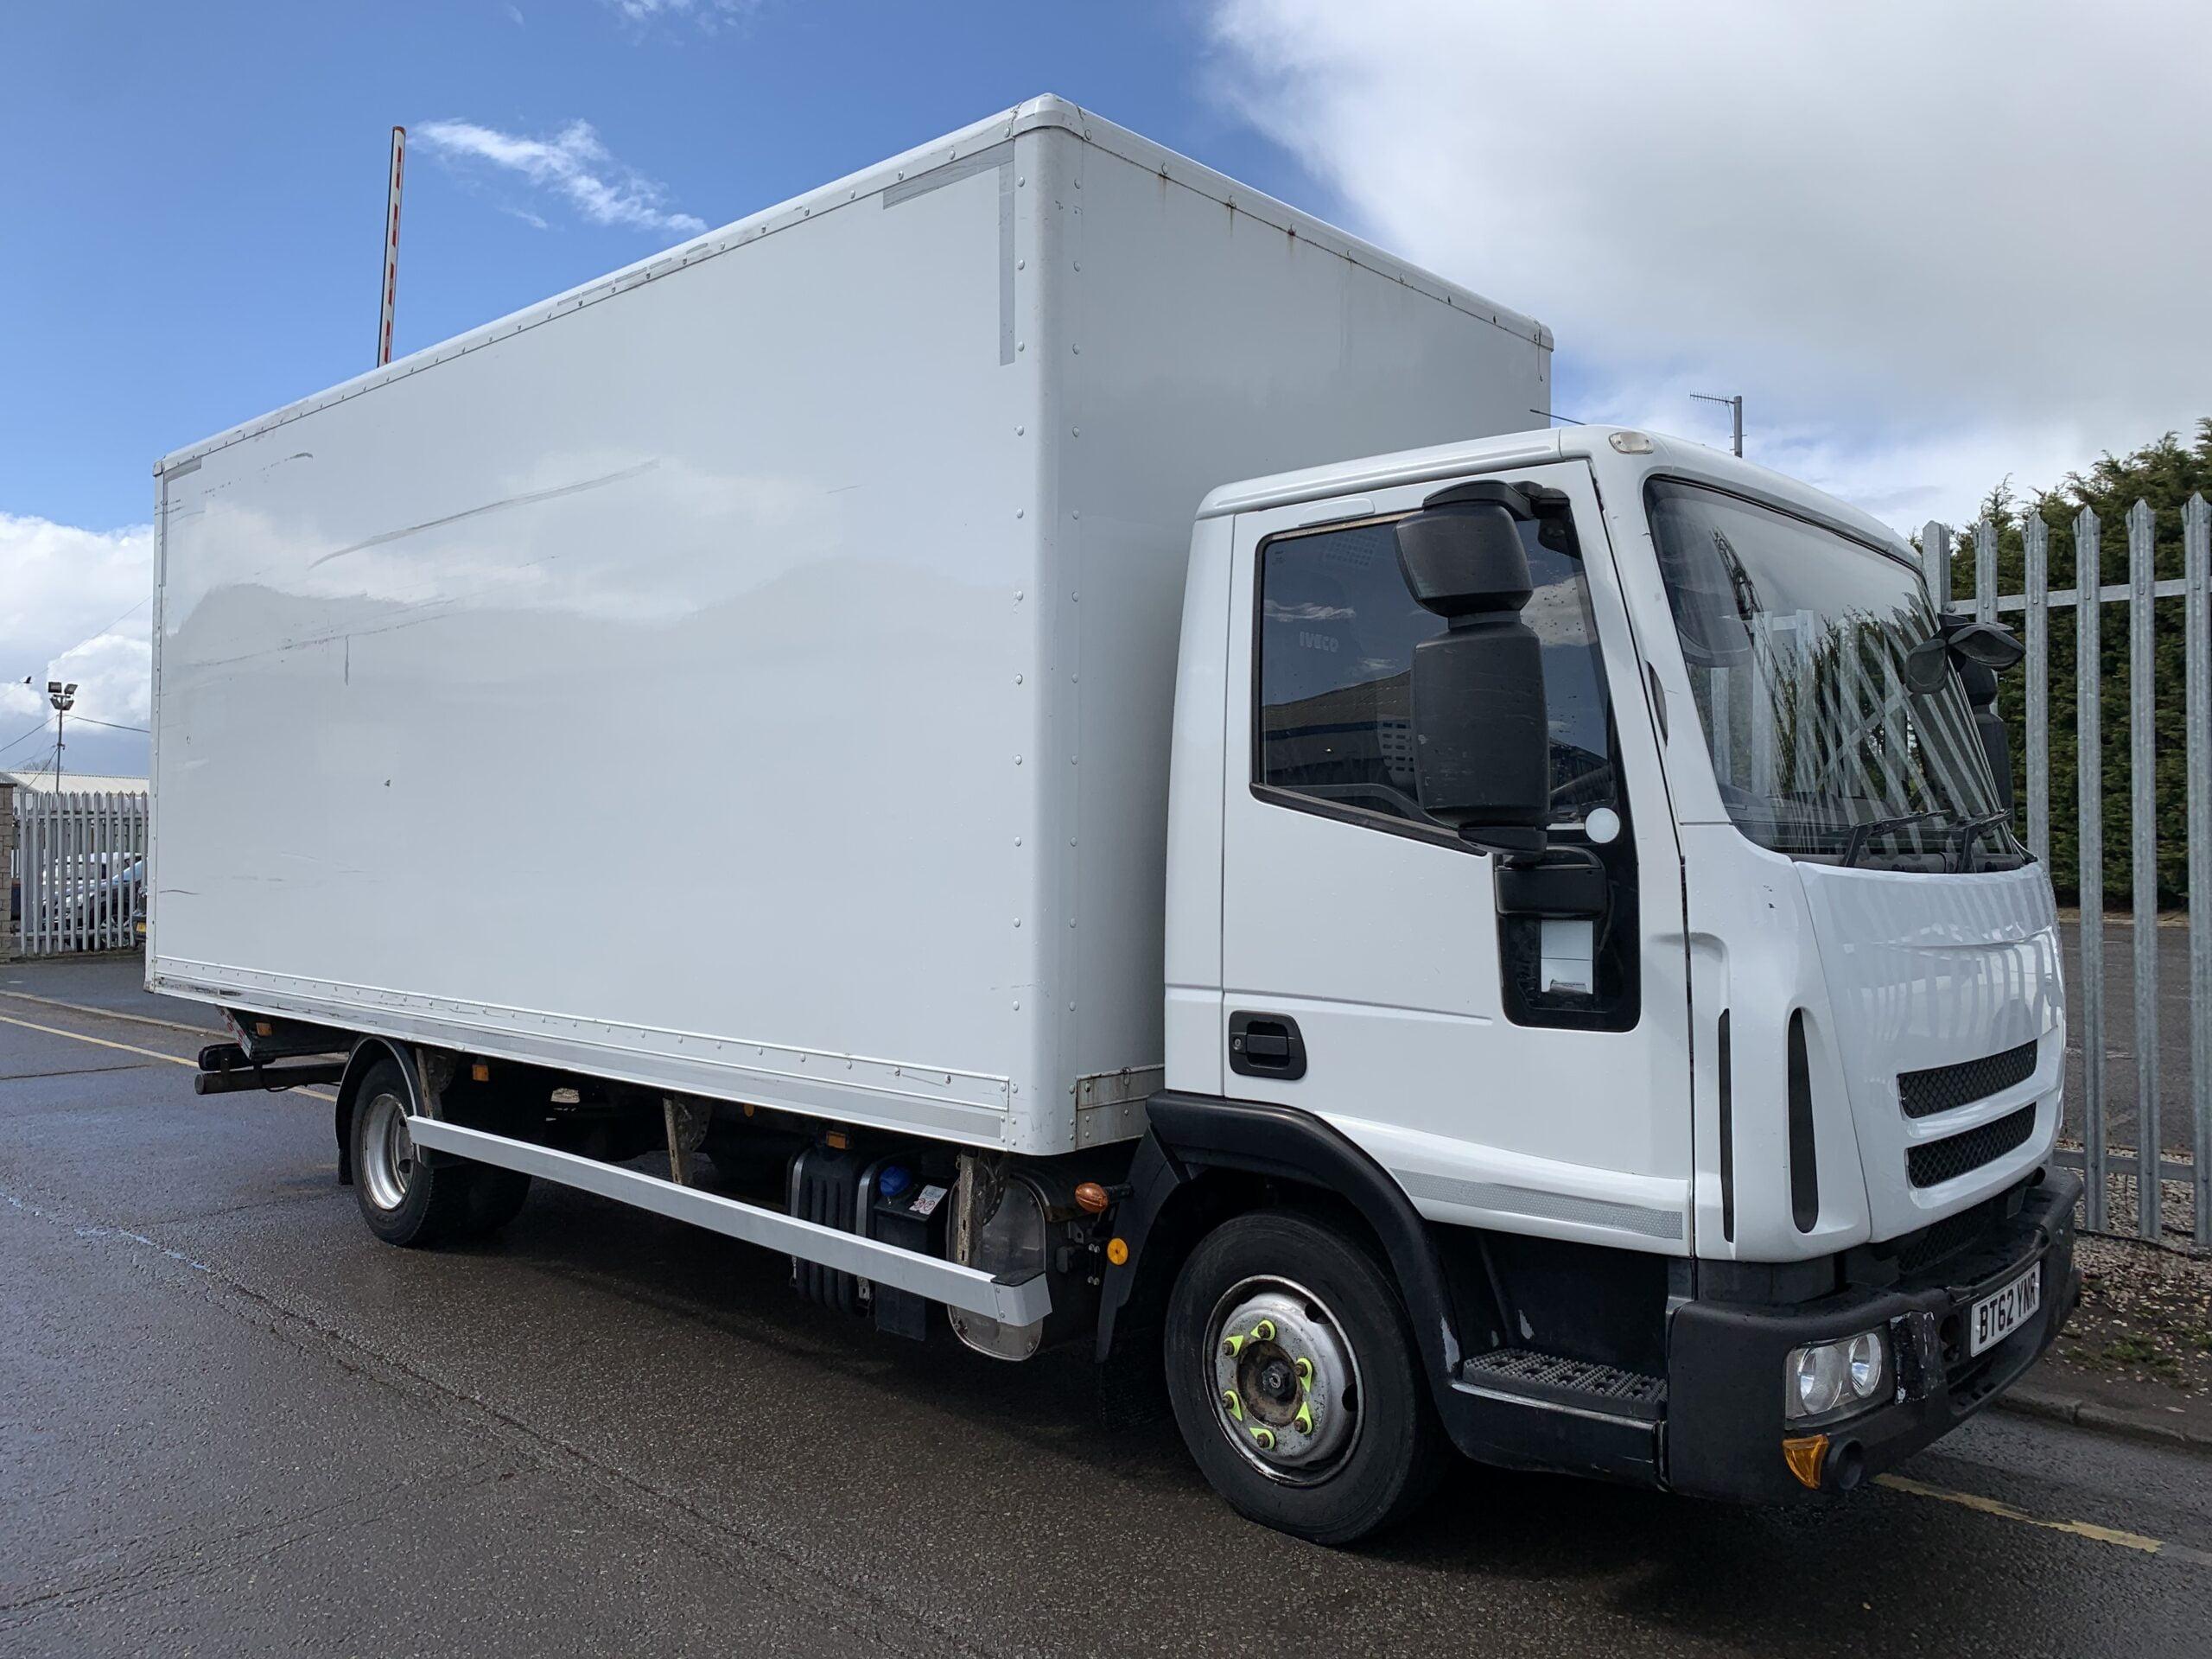 2012 (62) Iveco Euro Cargo, 7.5 Tonne, Euro 5, 160bhp, Anteo Tuckaway Tailift, 6m Body Length, Day Cab, Automatic Gearbox, 302,796km, 2 x Load Lock Rails, Roller Shutter Rear Door.